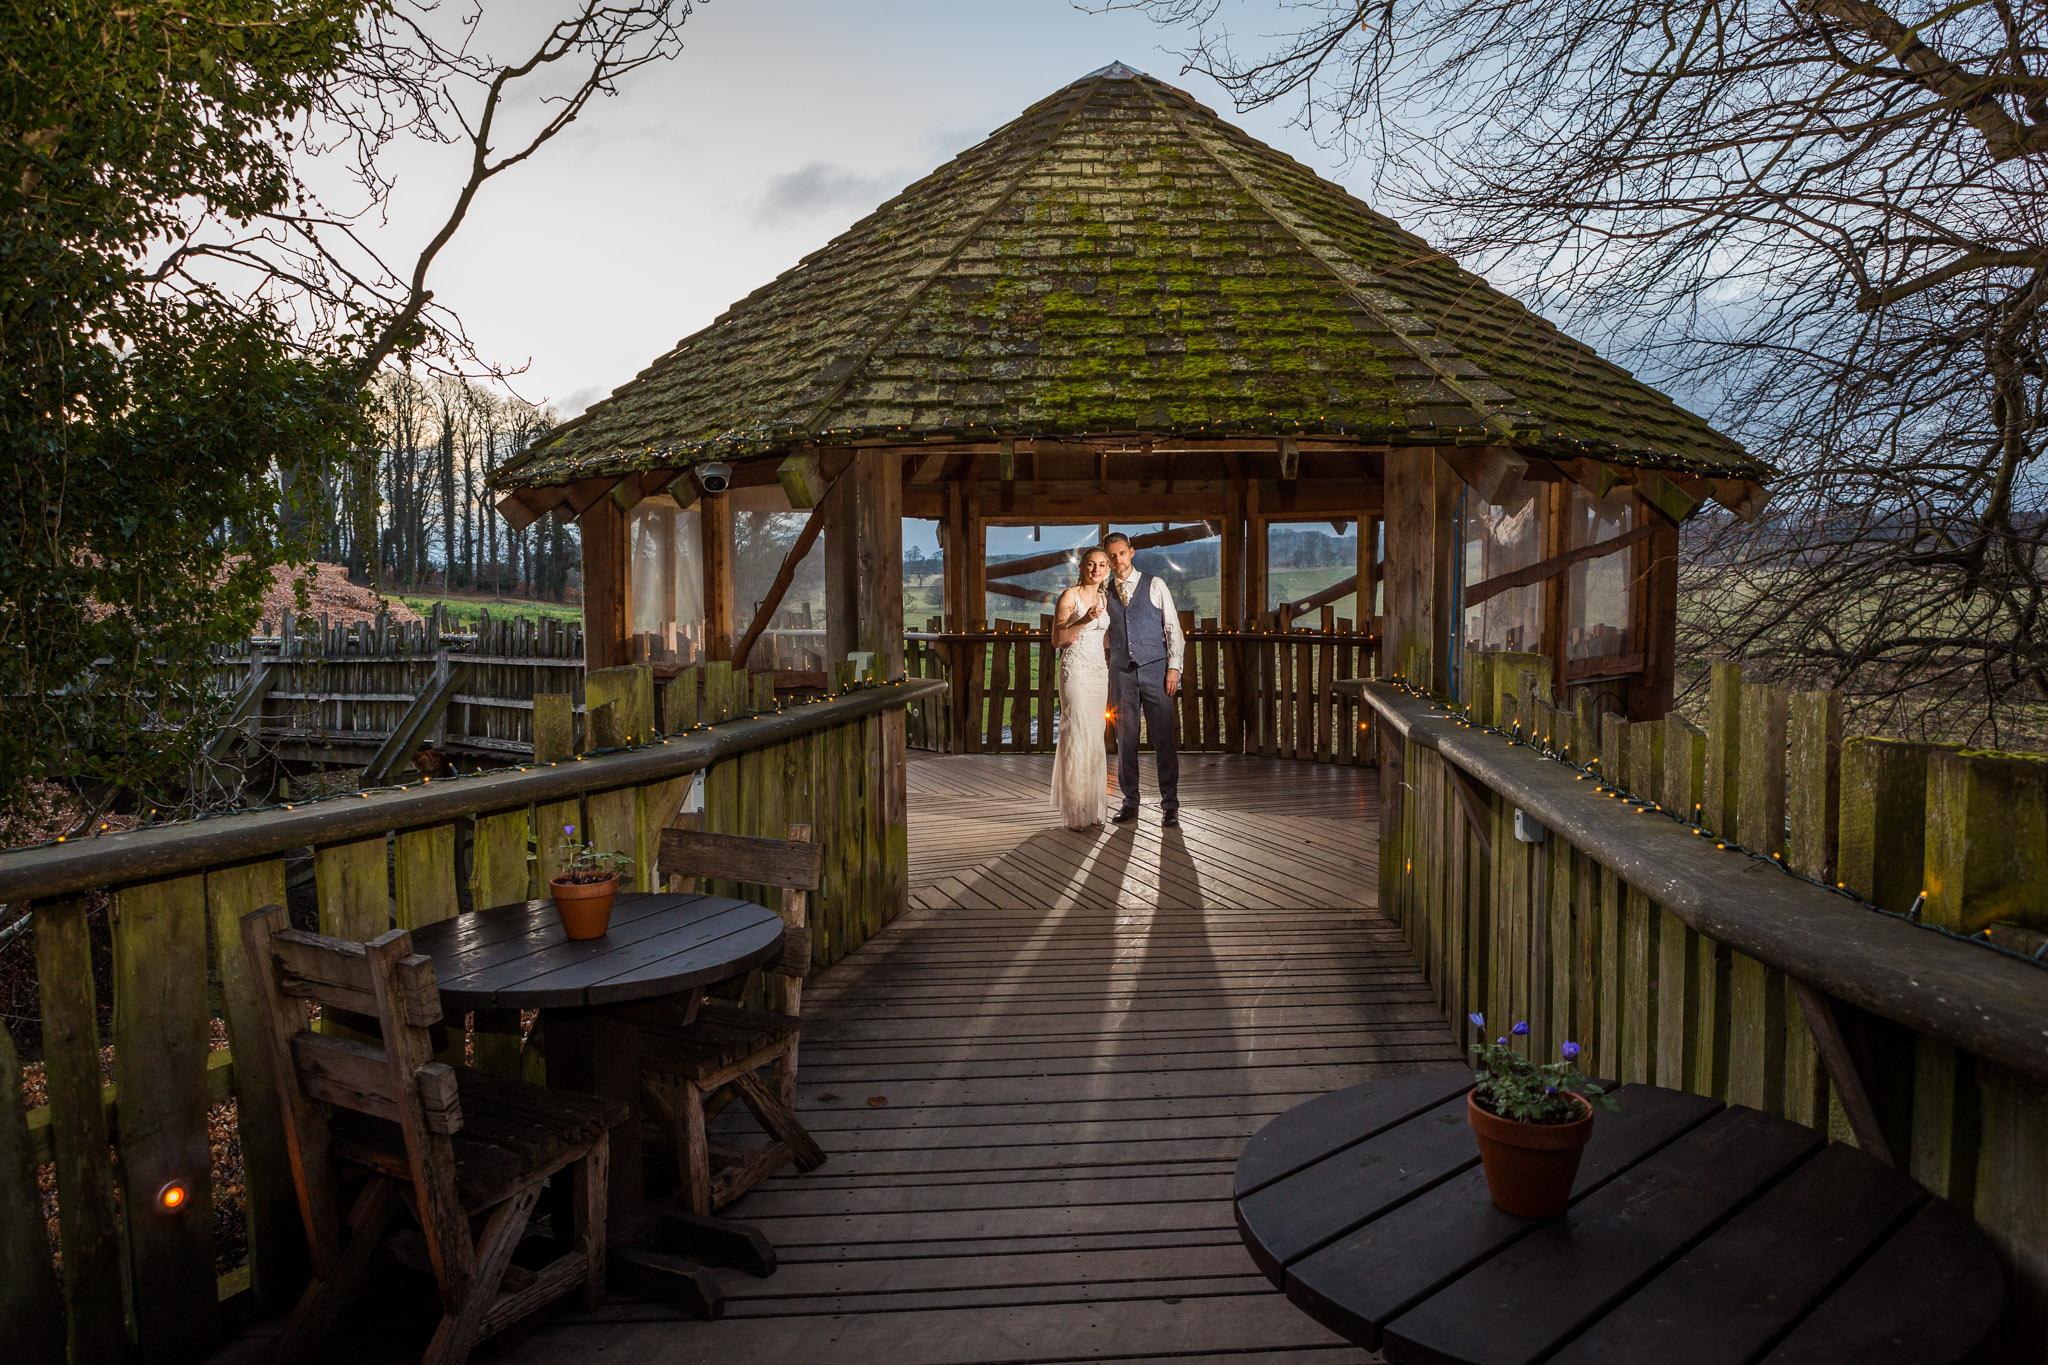 evening alnwick treehouse wedding